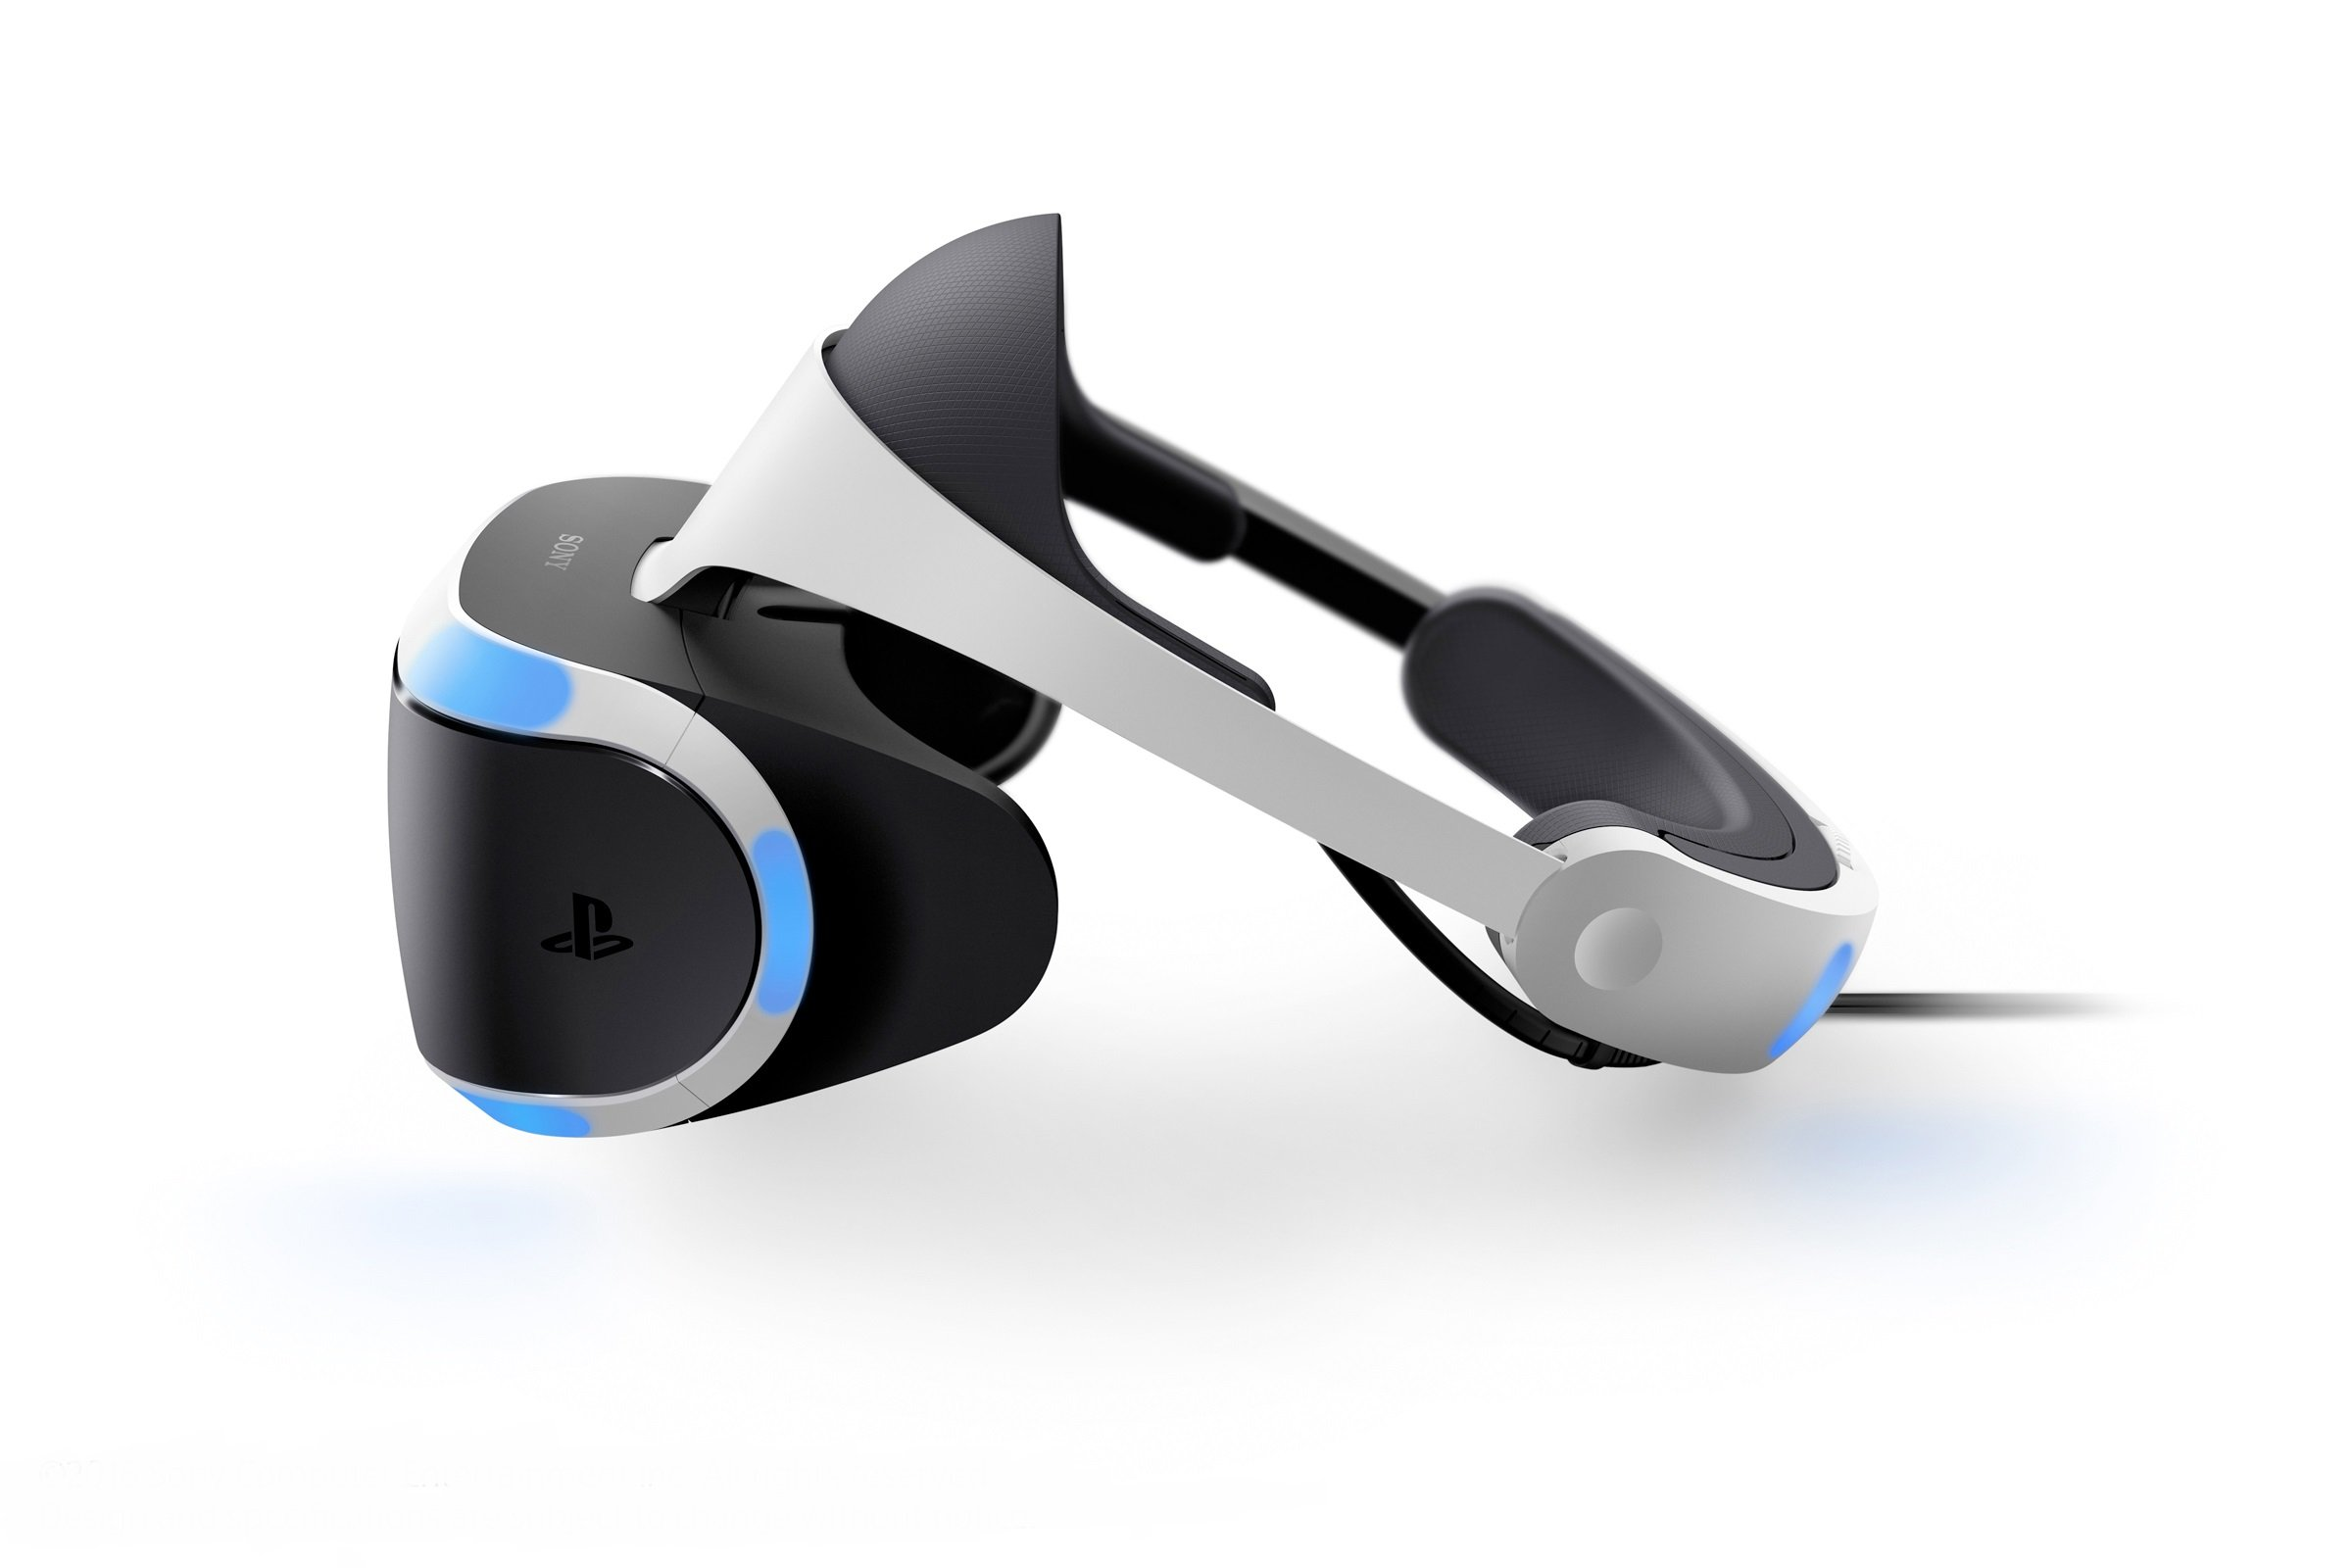 Sony VR bundle: Sonly PlayStaton 4 and PlayStation VR bundle